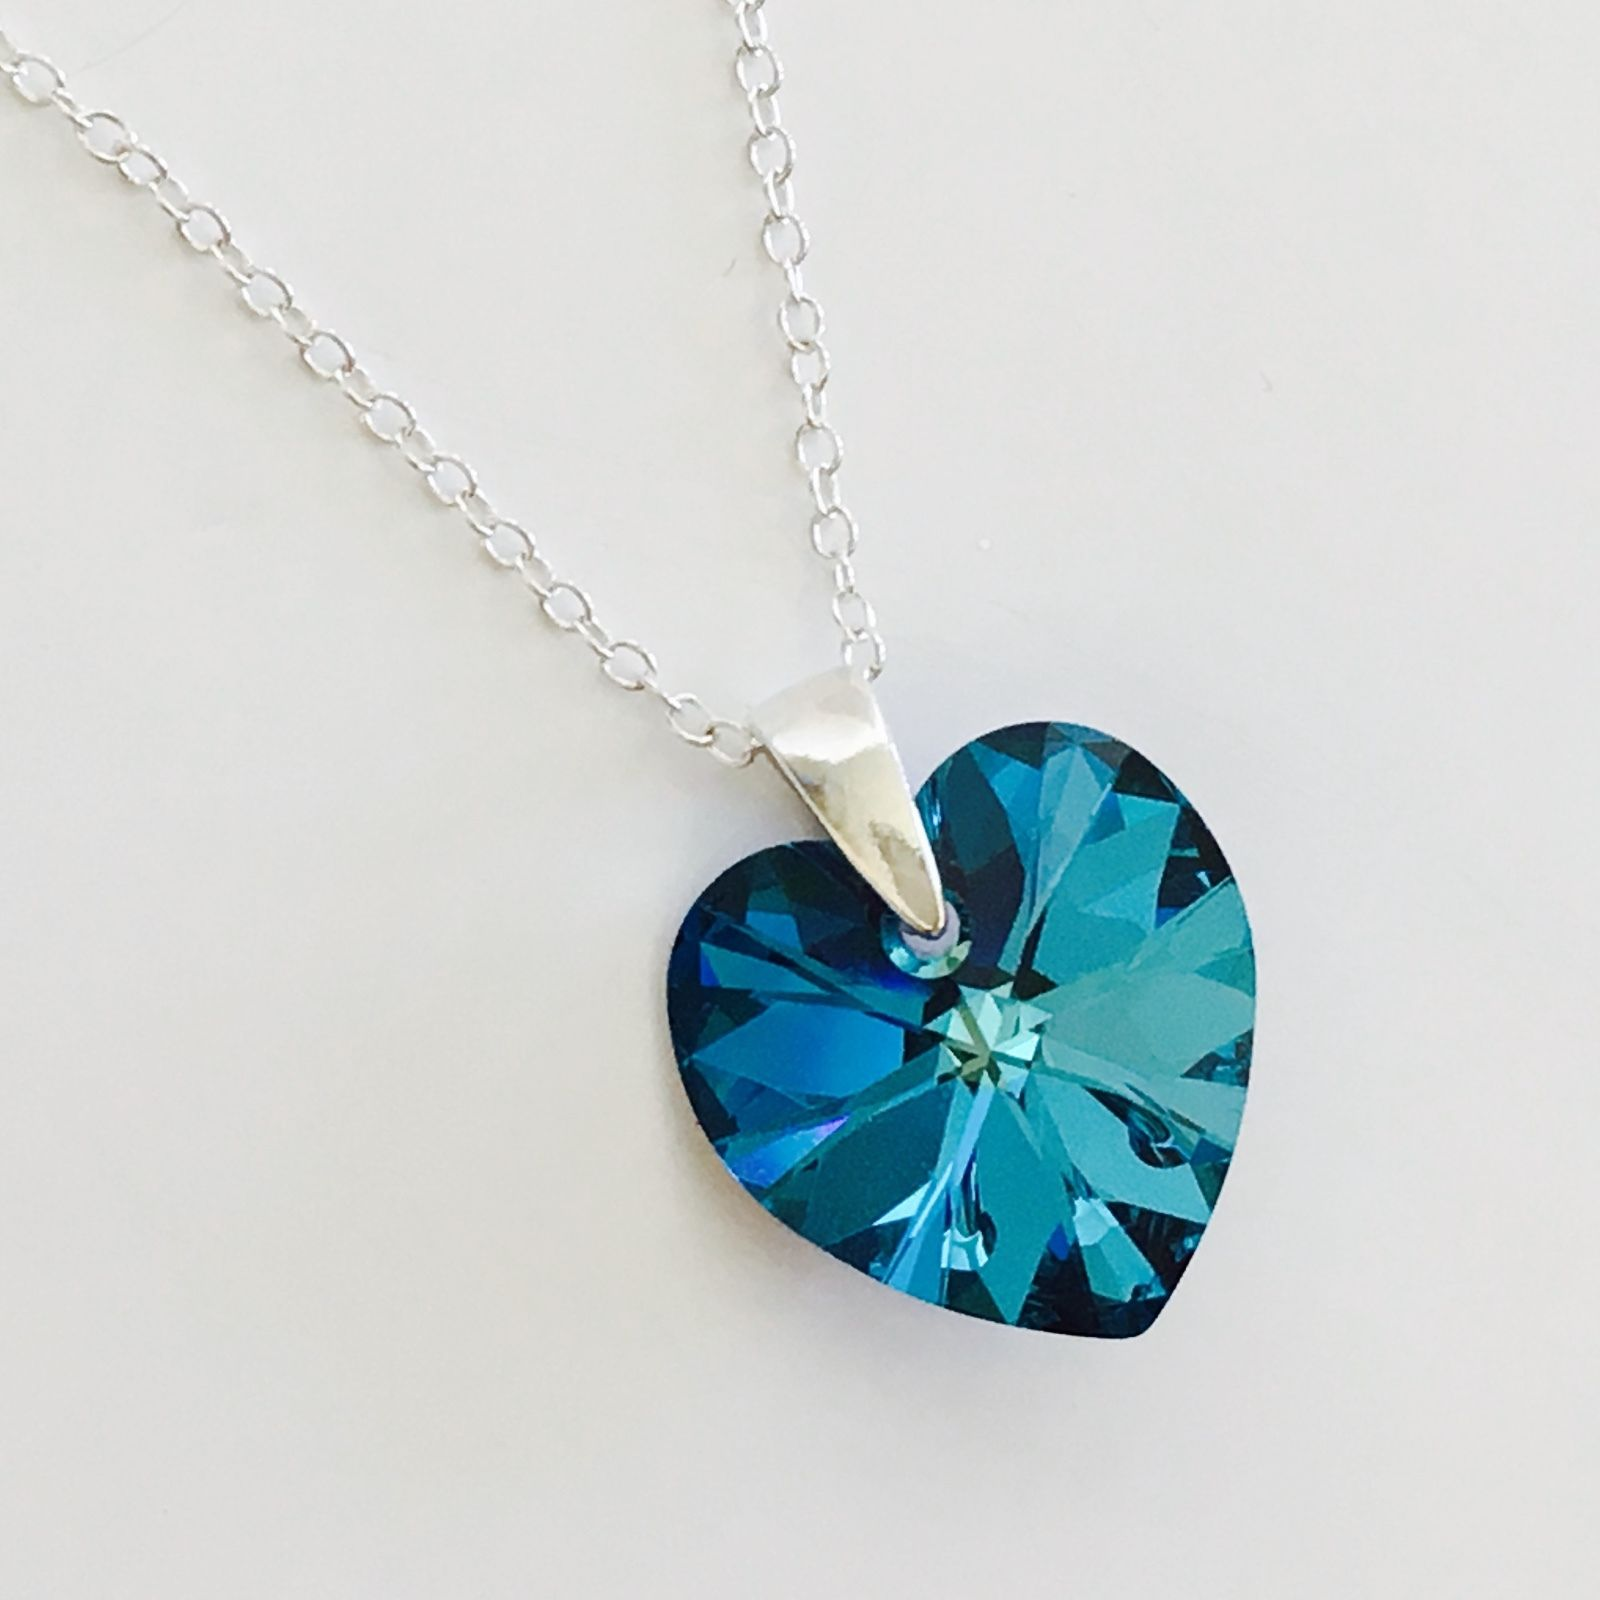 Swarovski Elements Bermuda Blue Heart Crystal Elegance